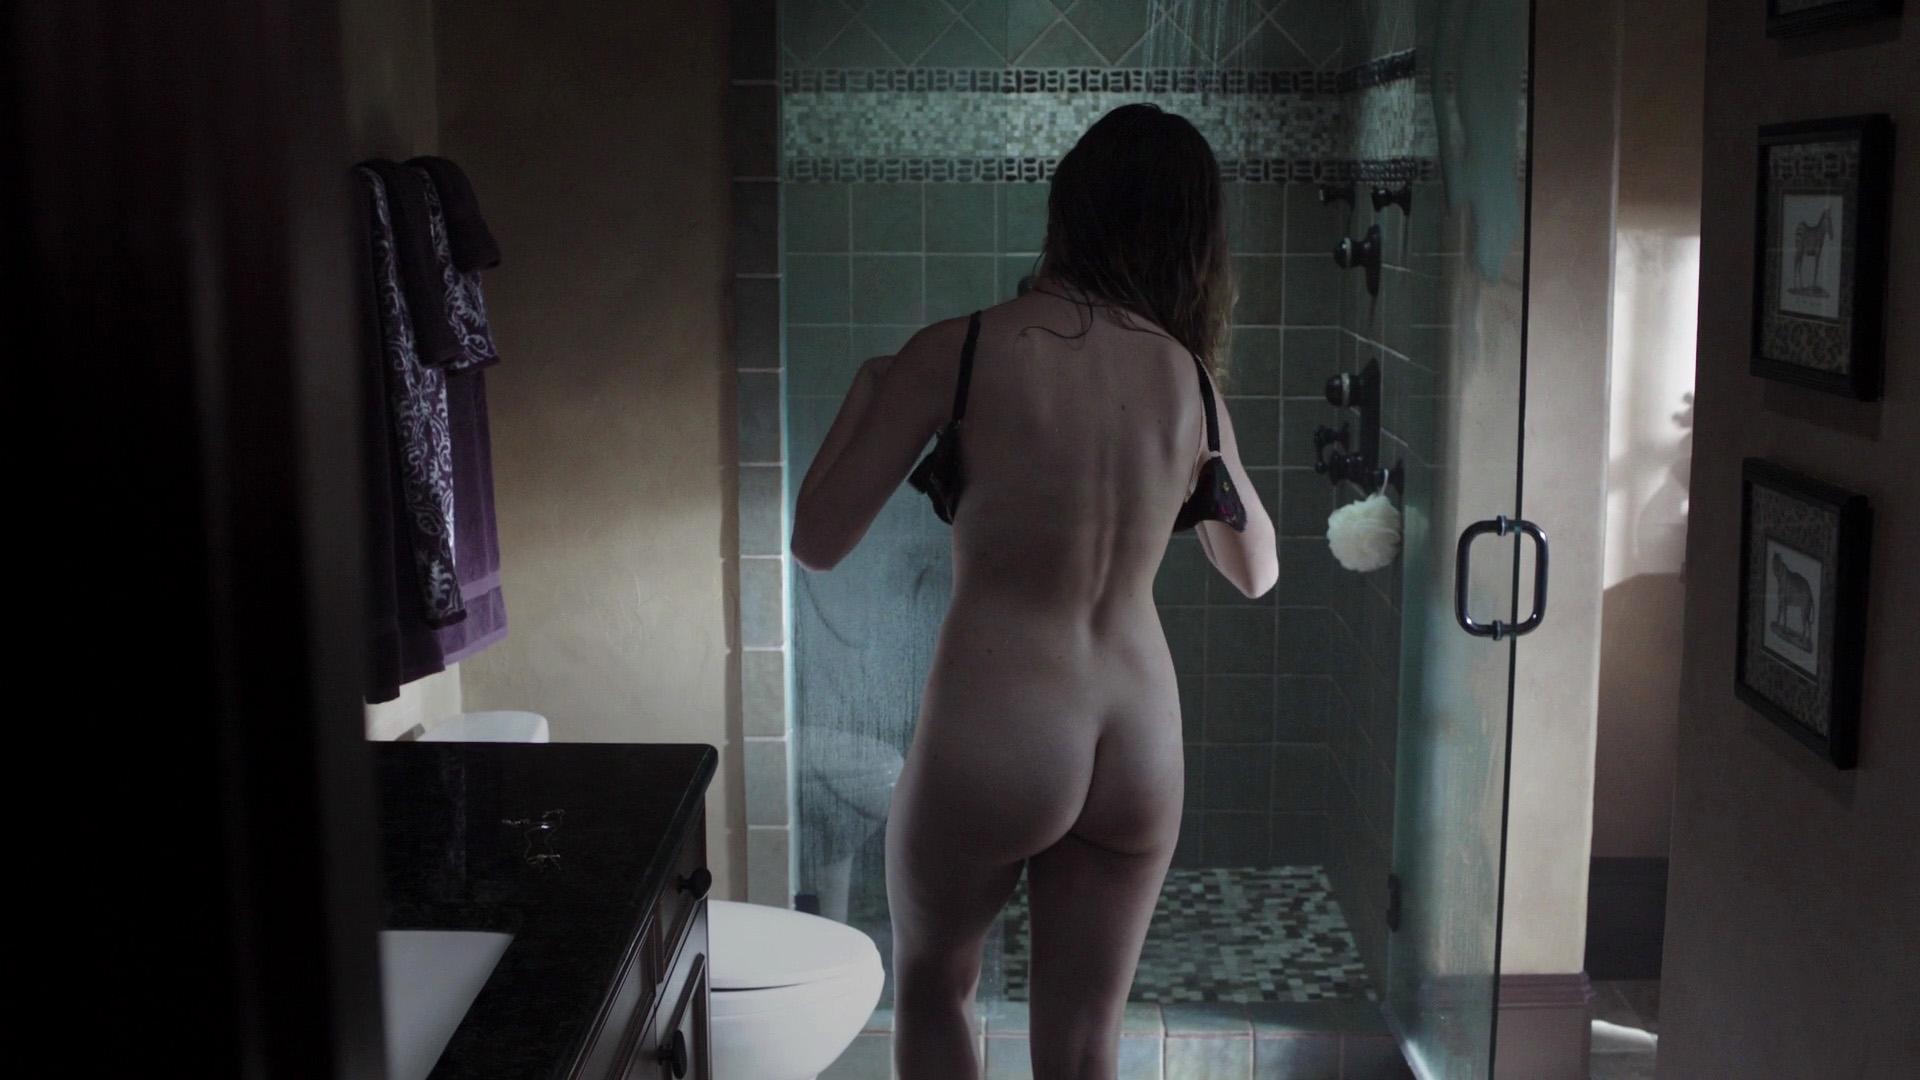 Lili simmons nackt